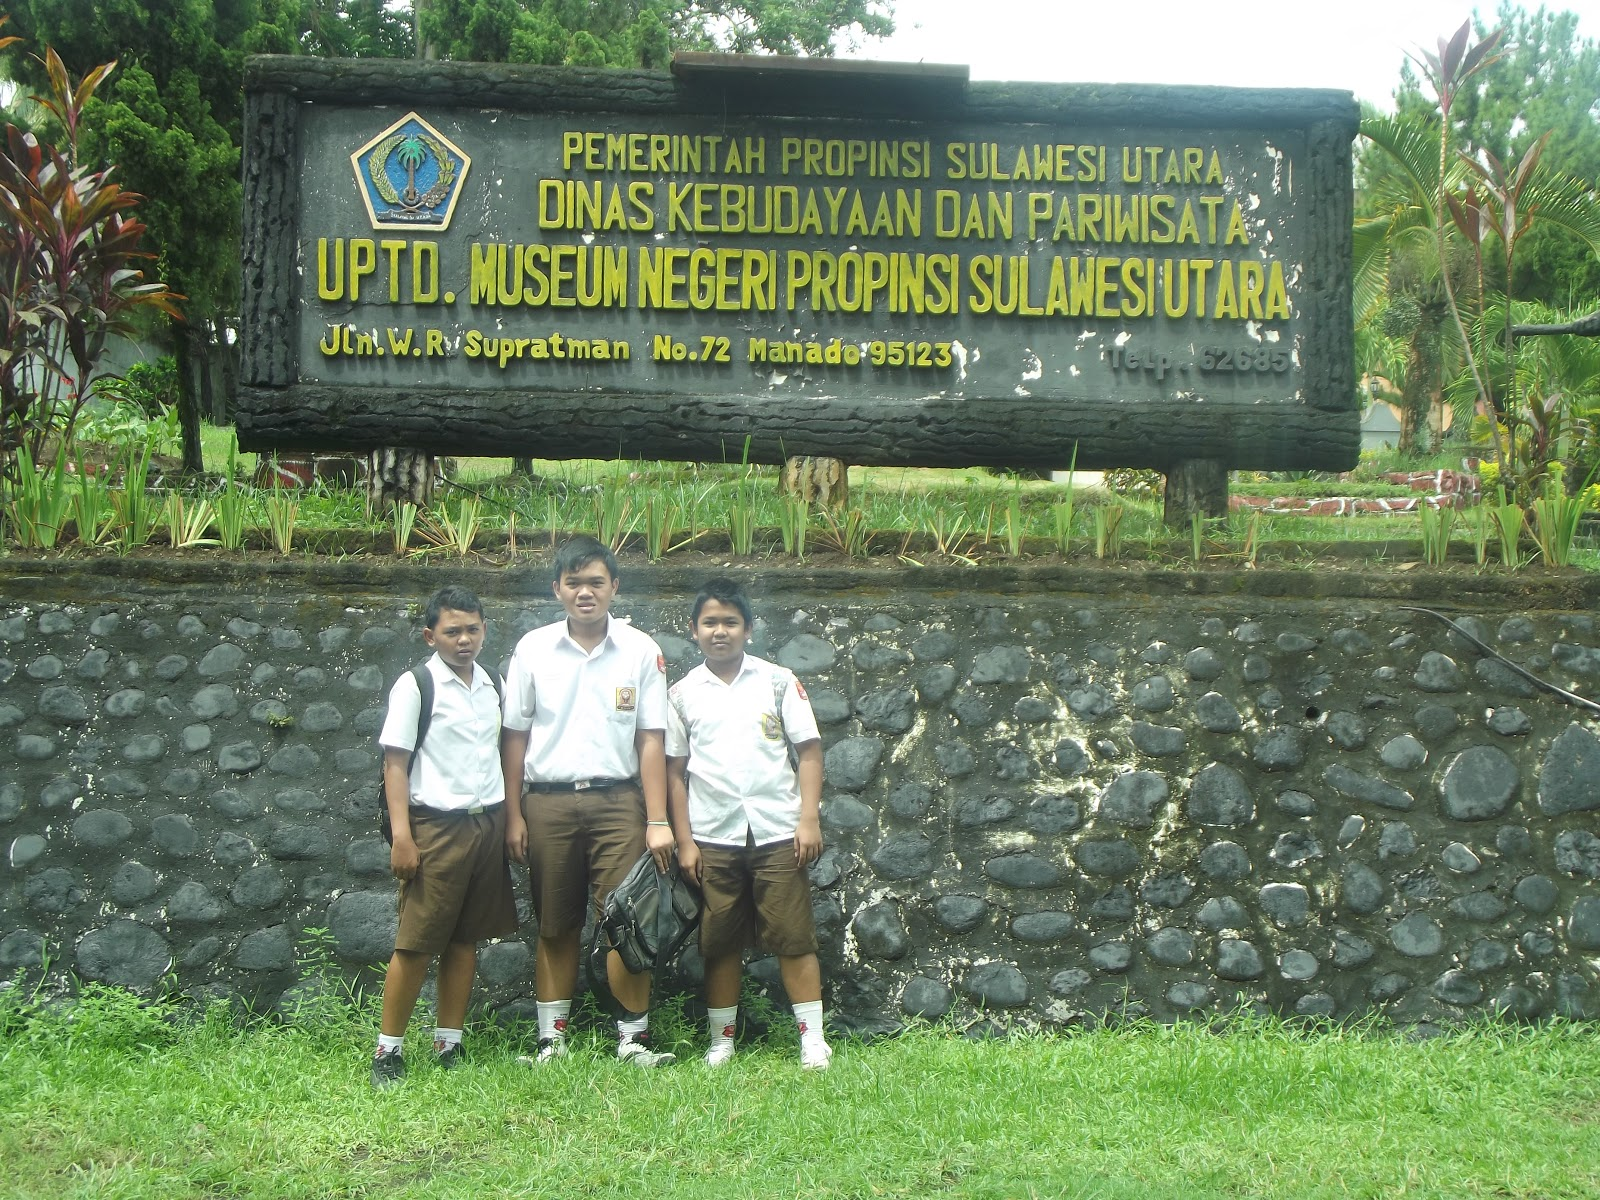 Senisulutku Informasi Mengenai Museum Negri Propinsi Sulawesi Utara Hai Kawan